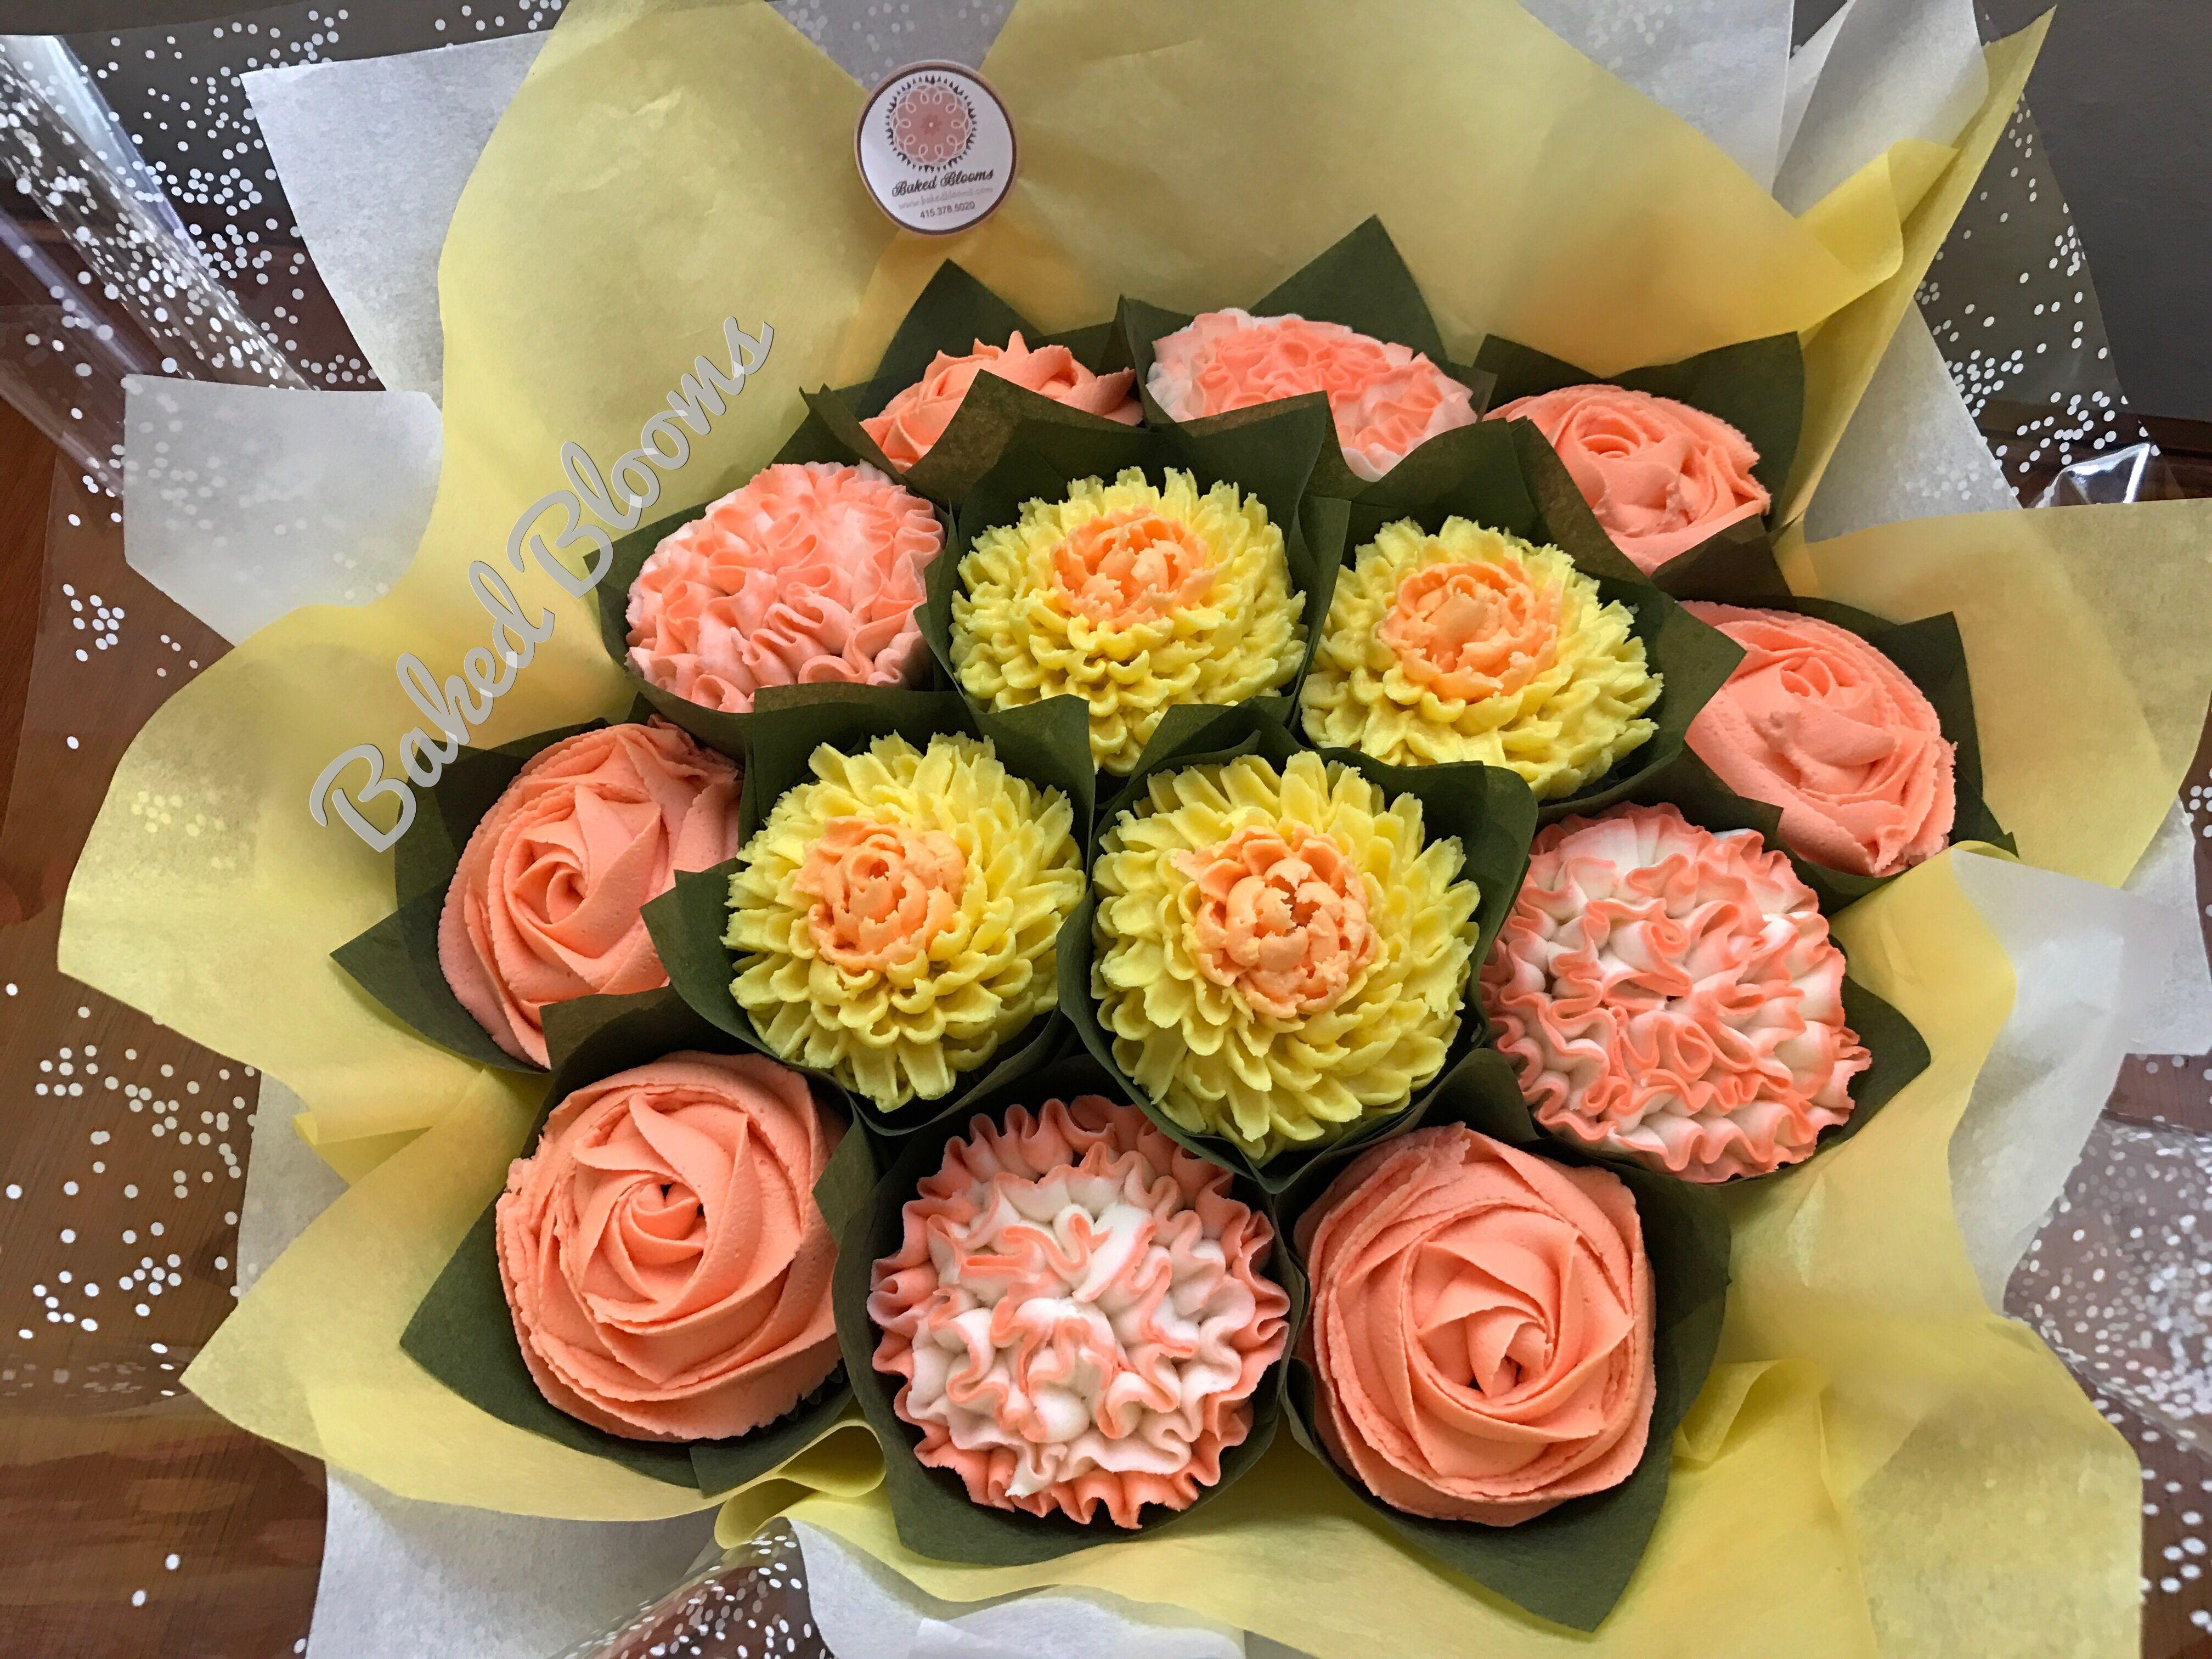 Roses, chrysanthemums and carnation arrangement www